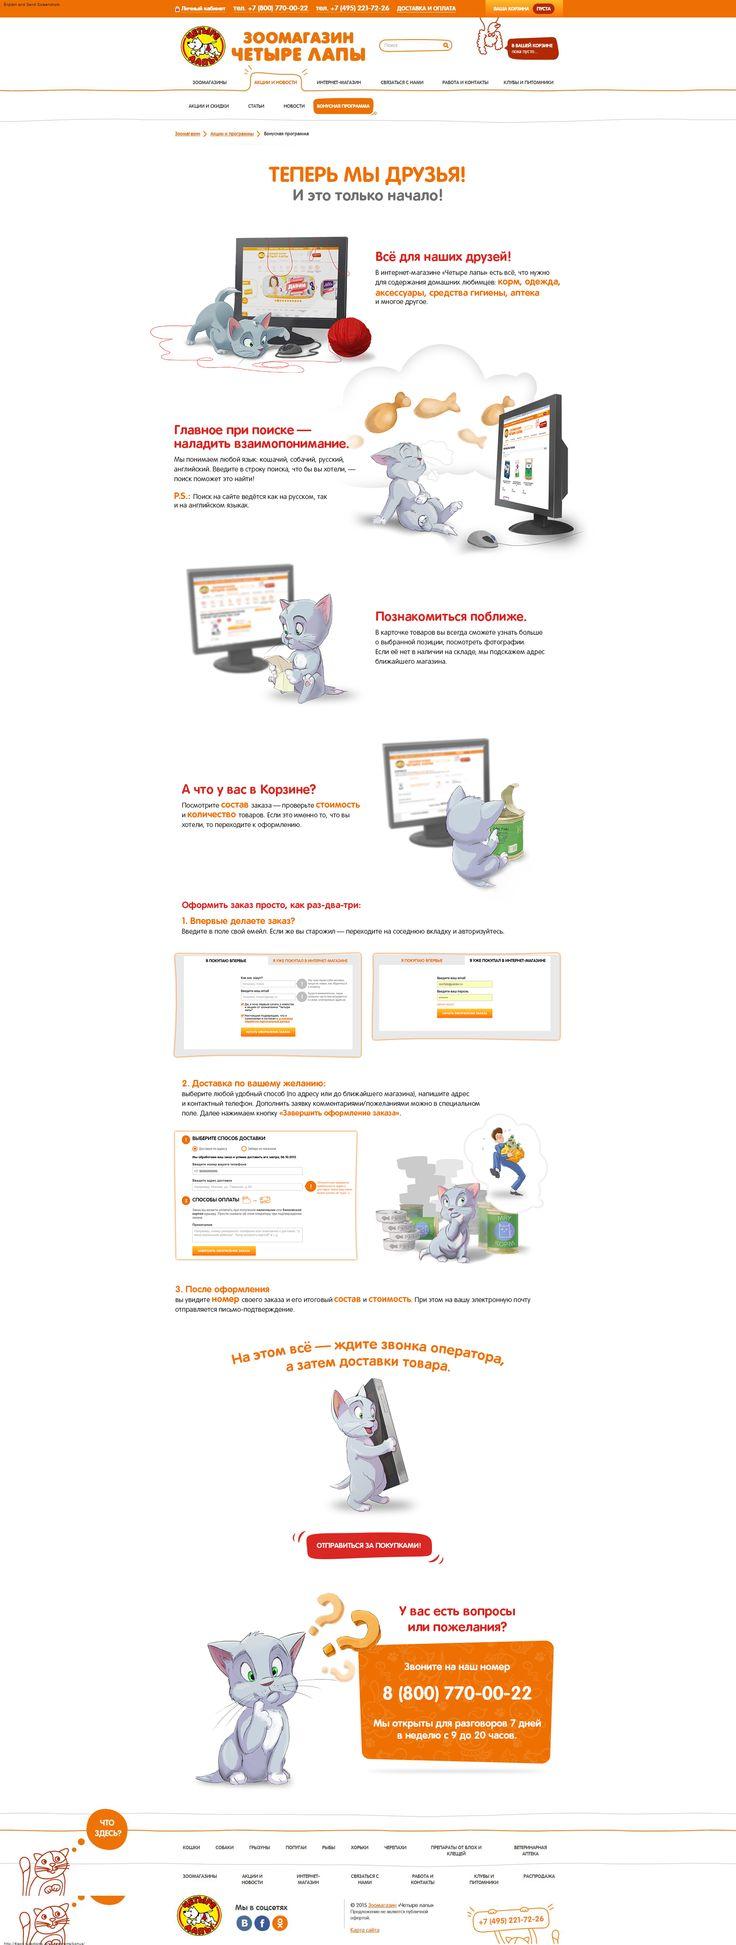 CHETYRE LAPY: Detailed manual how to order goods. // ЧЕТЫРЕ ЛАПЫ: Подробная инструкция, как заказать товар на сайте. #EMAILMATRIX #emailmarketing #landingpage